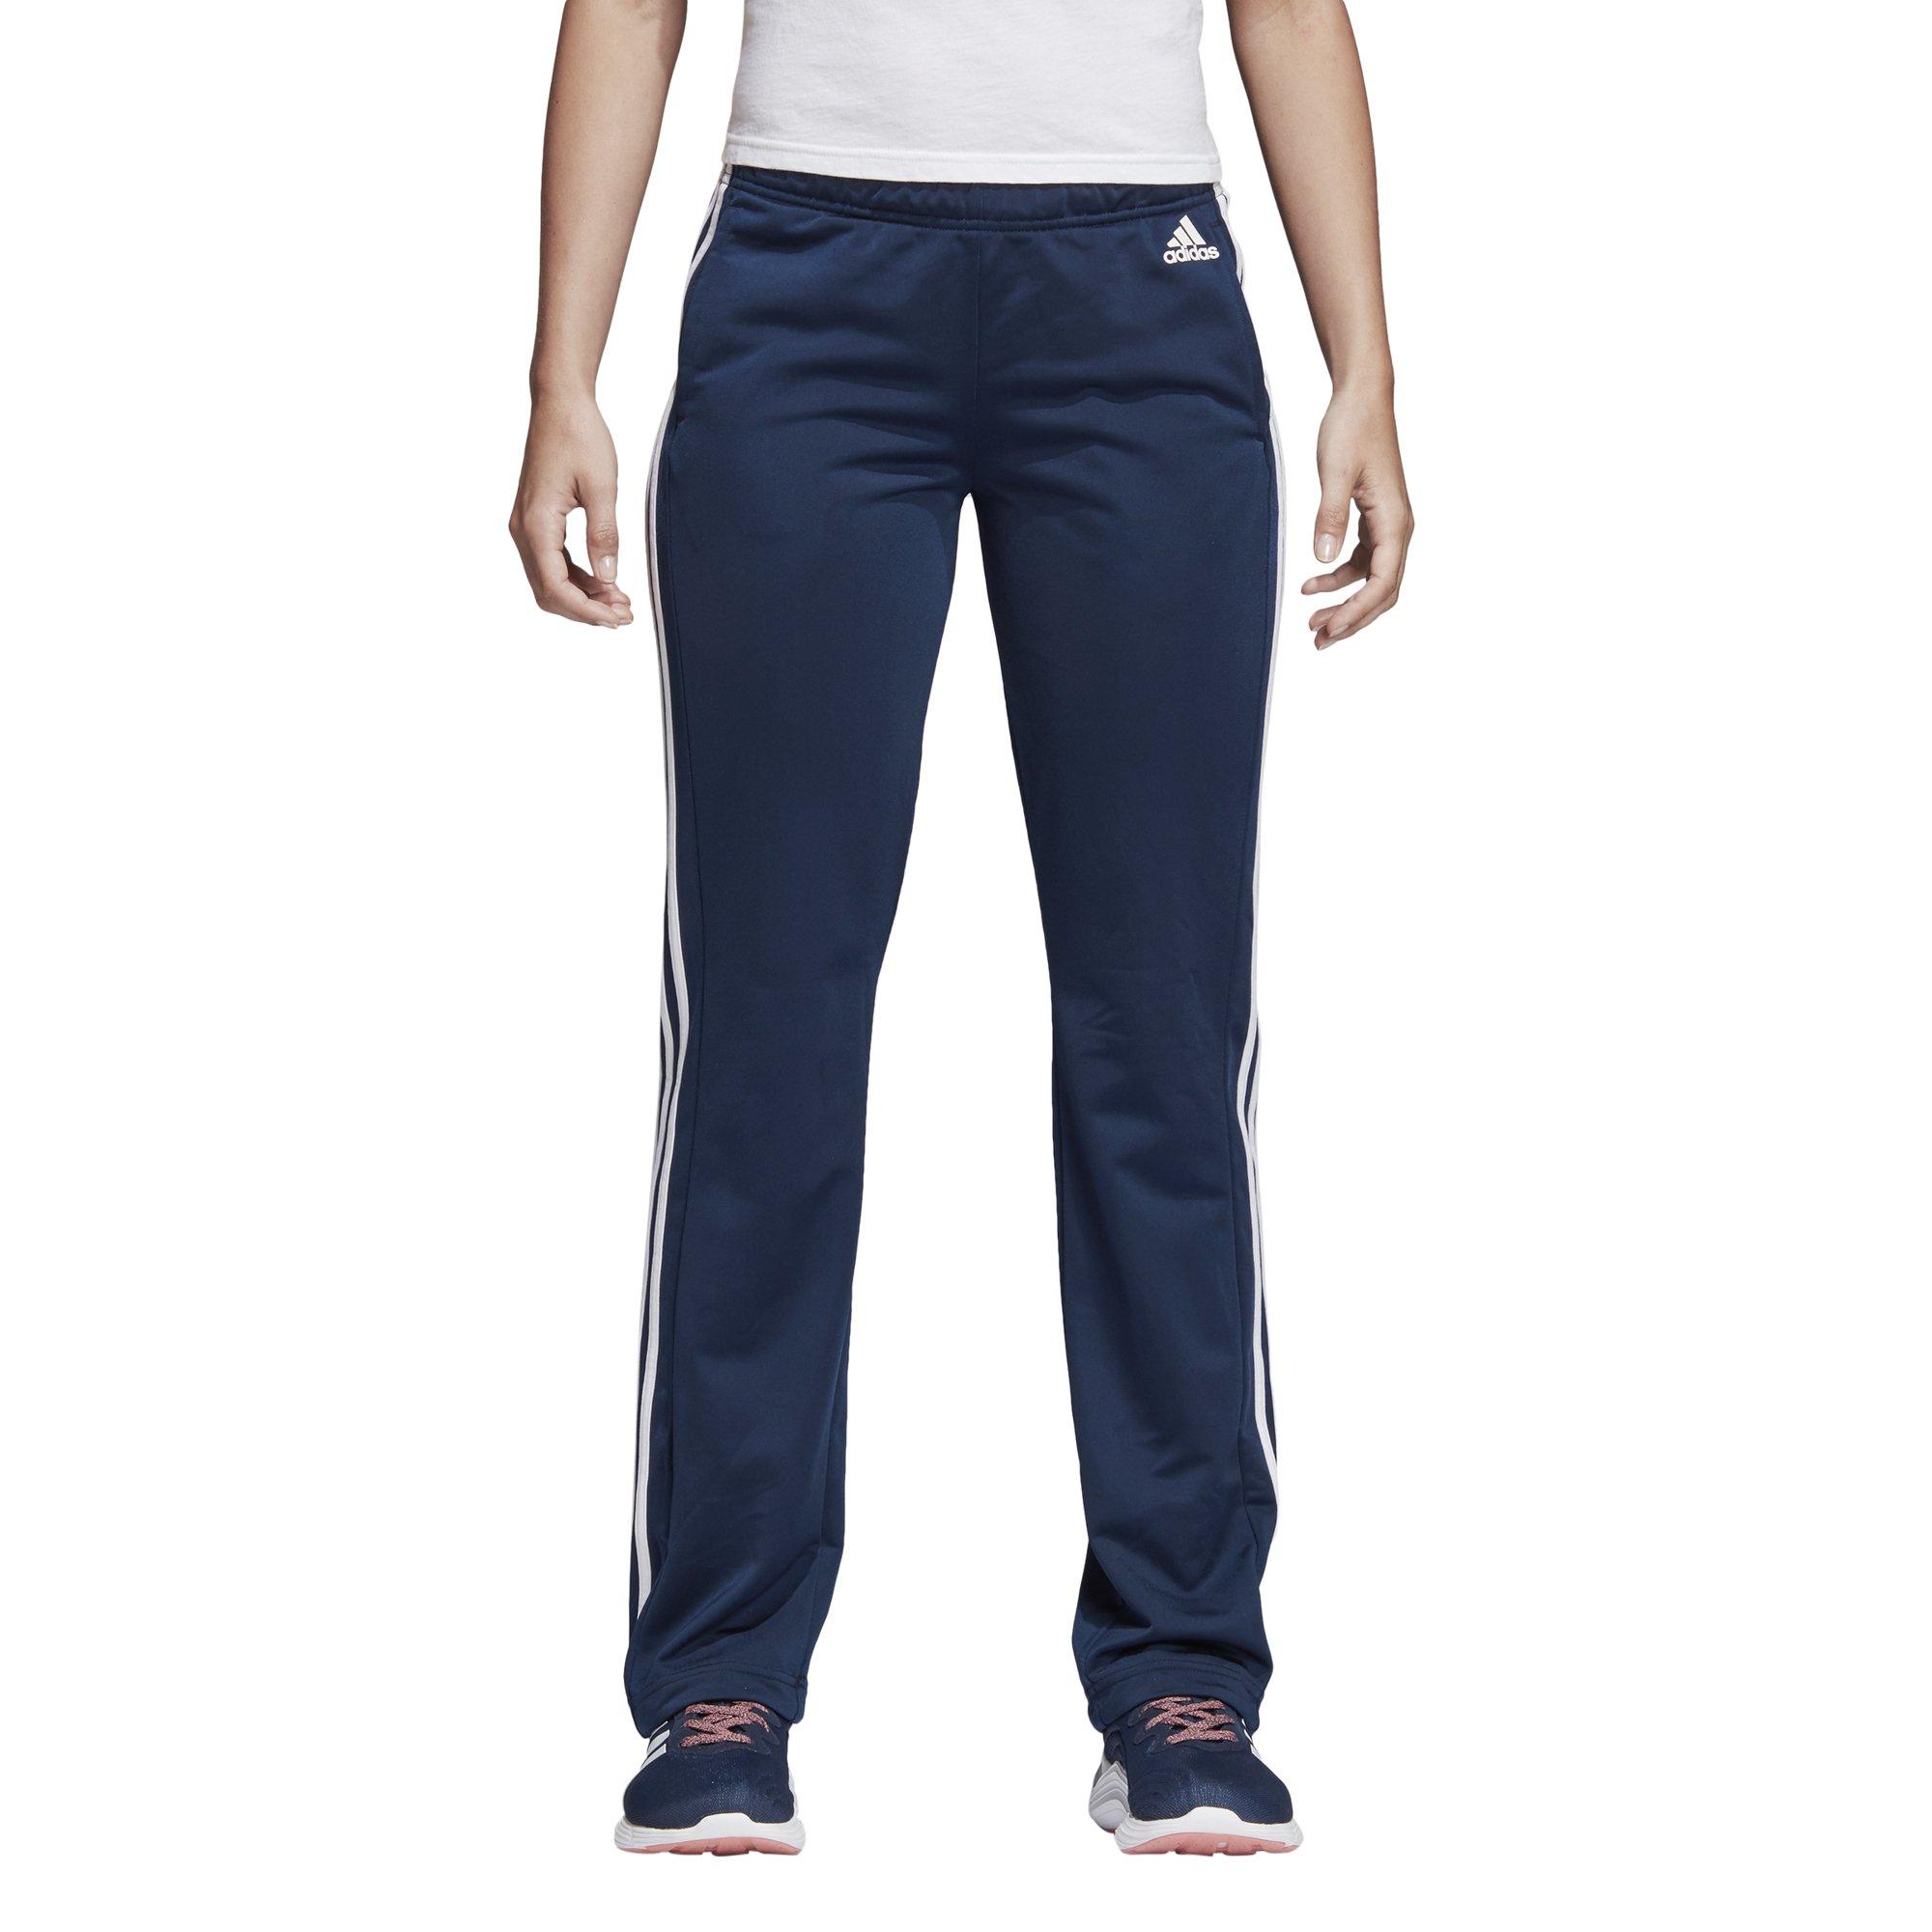 adidas Women's Designed 2 Move Straight Pants, Collegiate Navy/White, X-Small